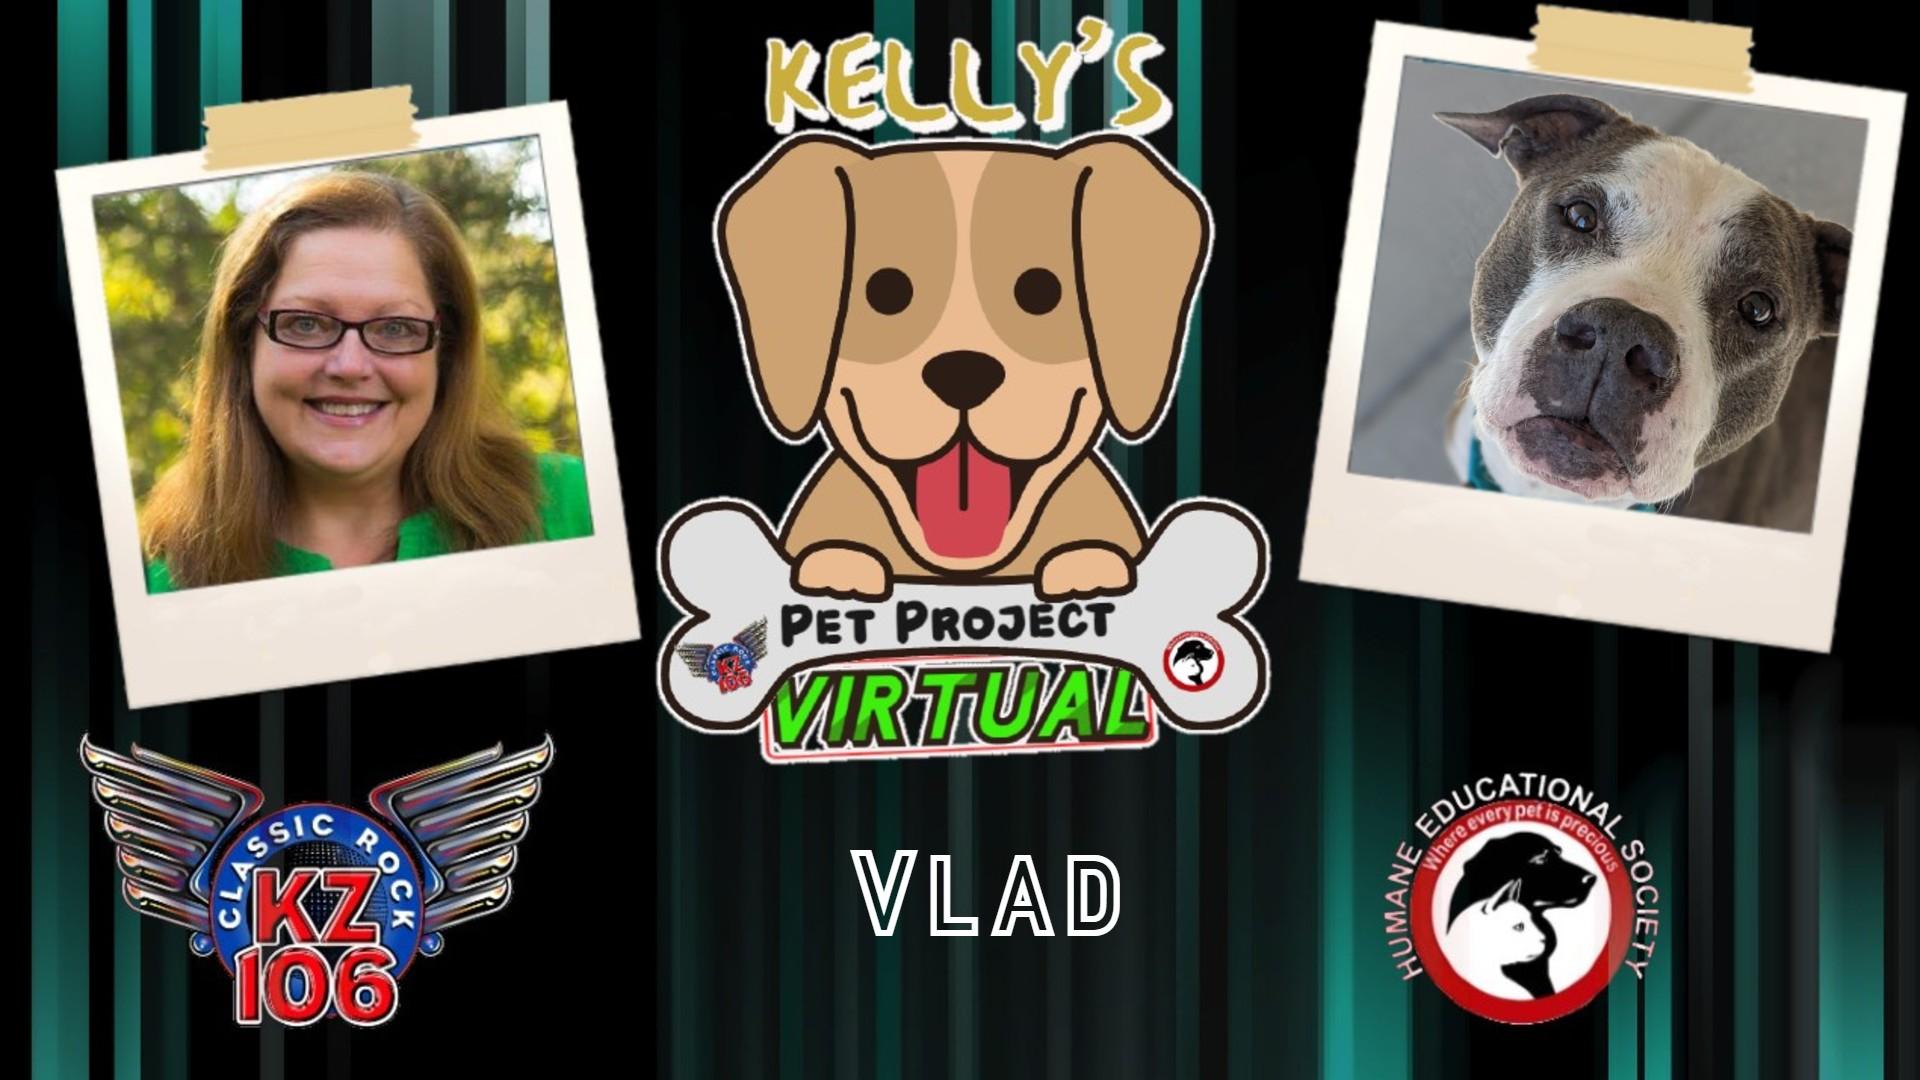 Kelly's Pet Project: Vlad